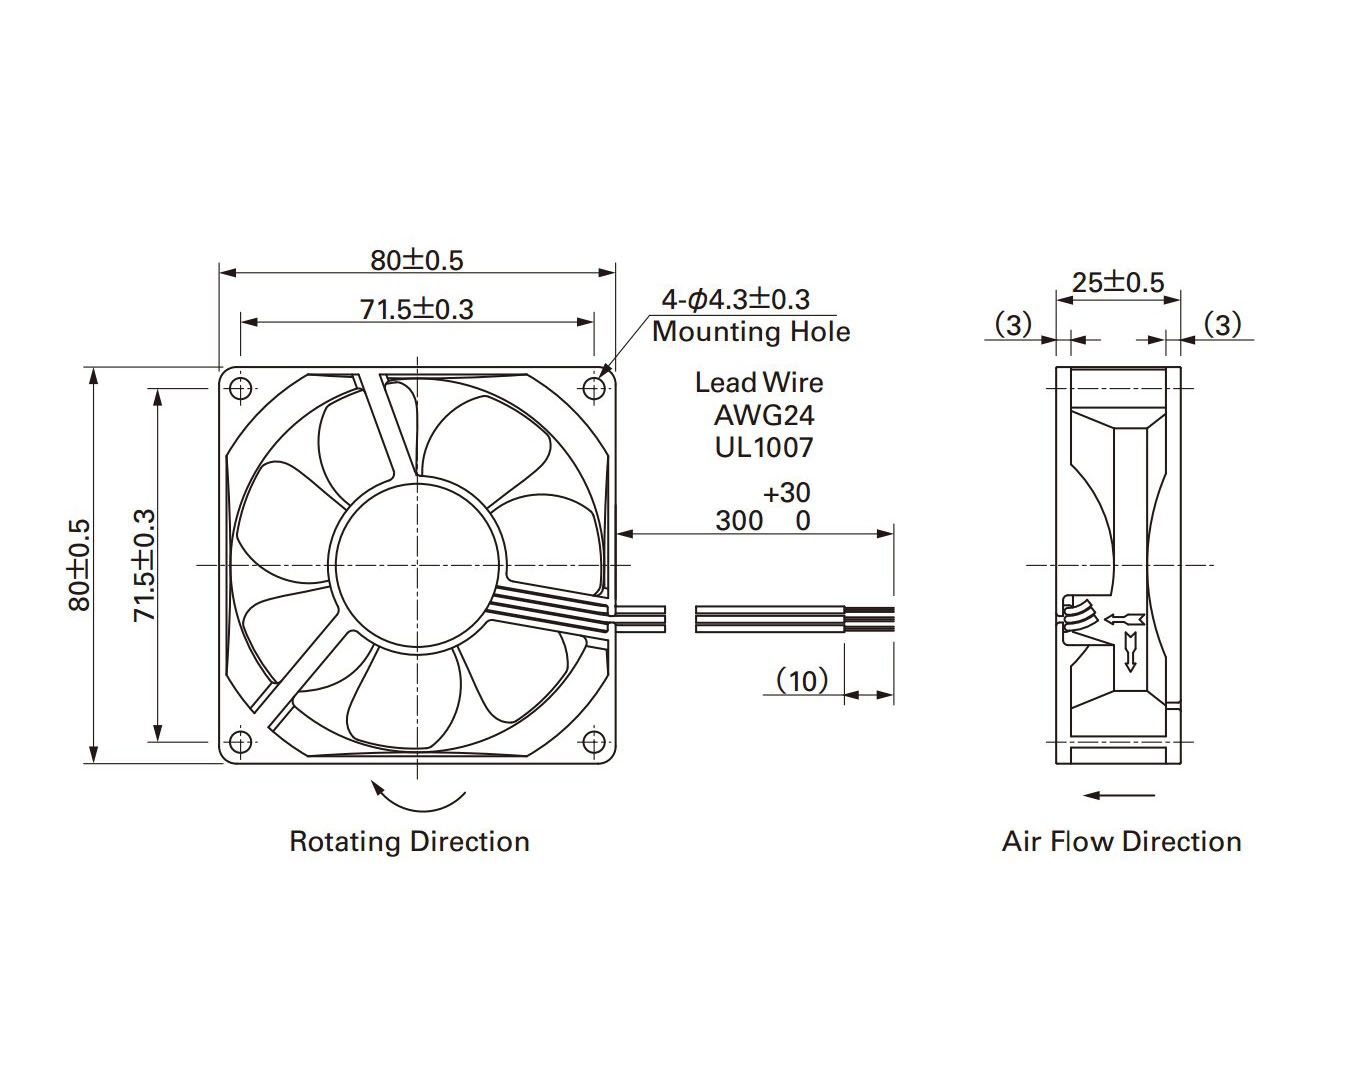 hight resolution of box fan diagram wiring diagram todays saab 97 radio diagram image box fan wiring diagram